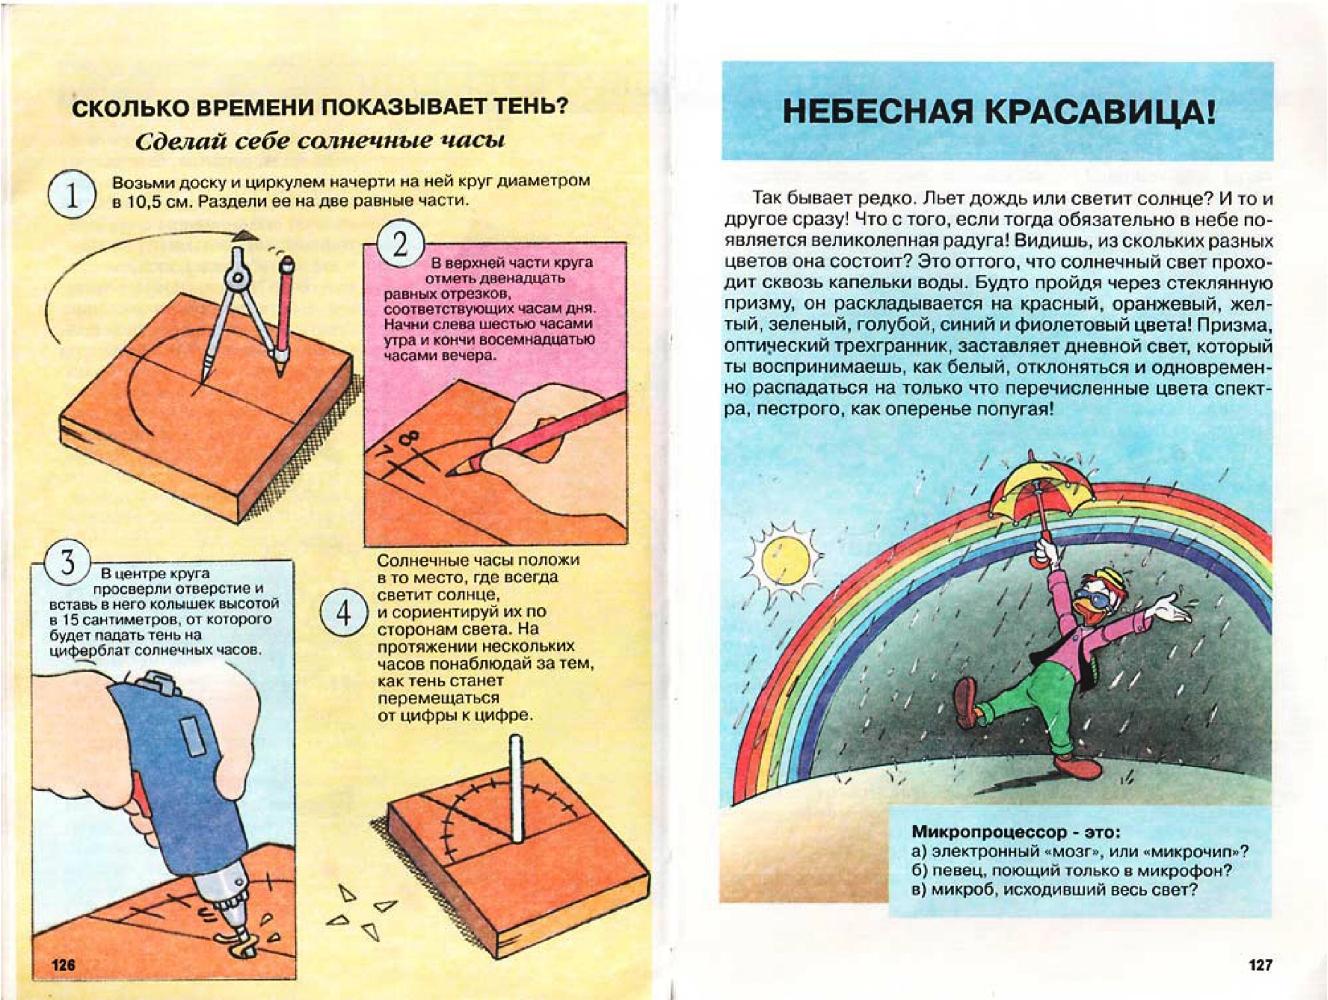 http://i6.imageban.ru/out/2013/12/06/89d4682ae4eab63f25ea44df2089441a.jpg